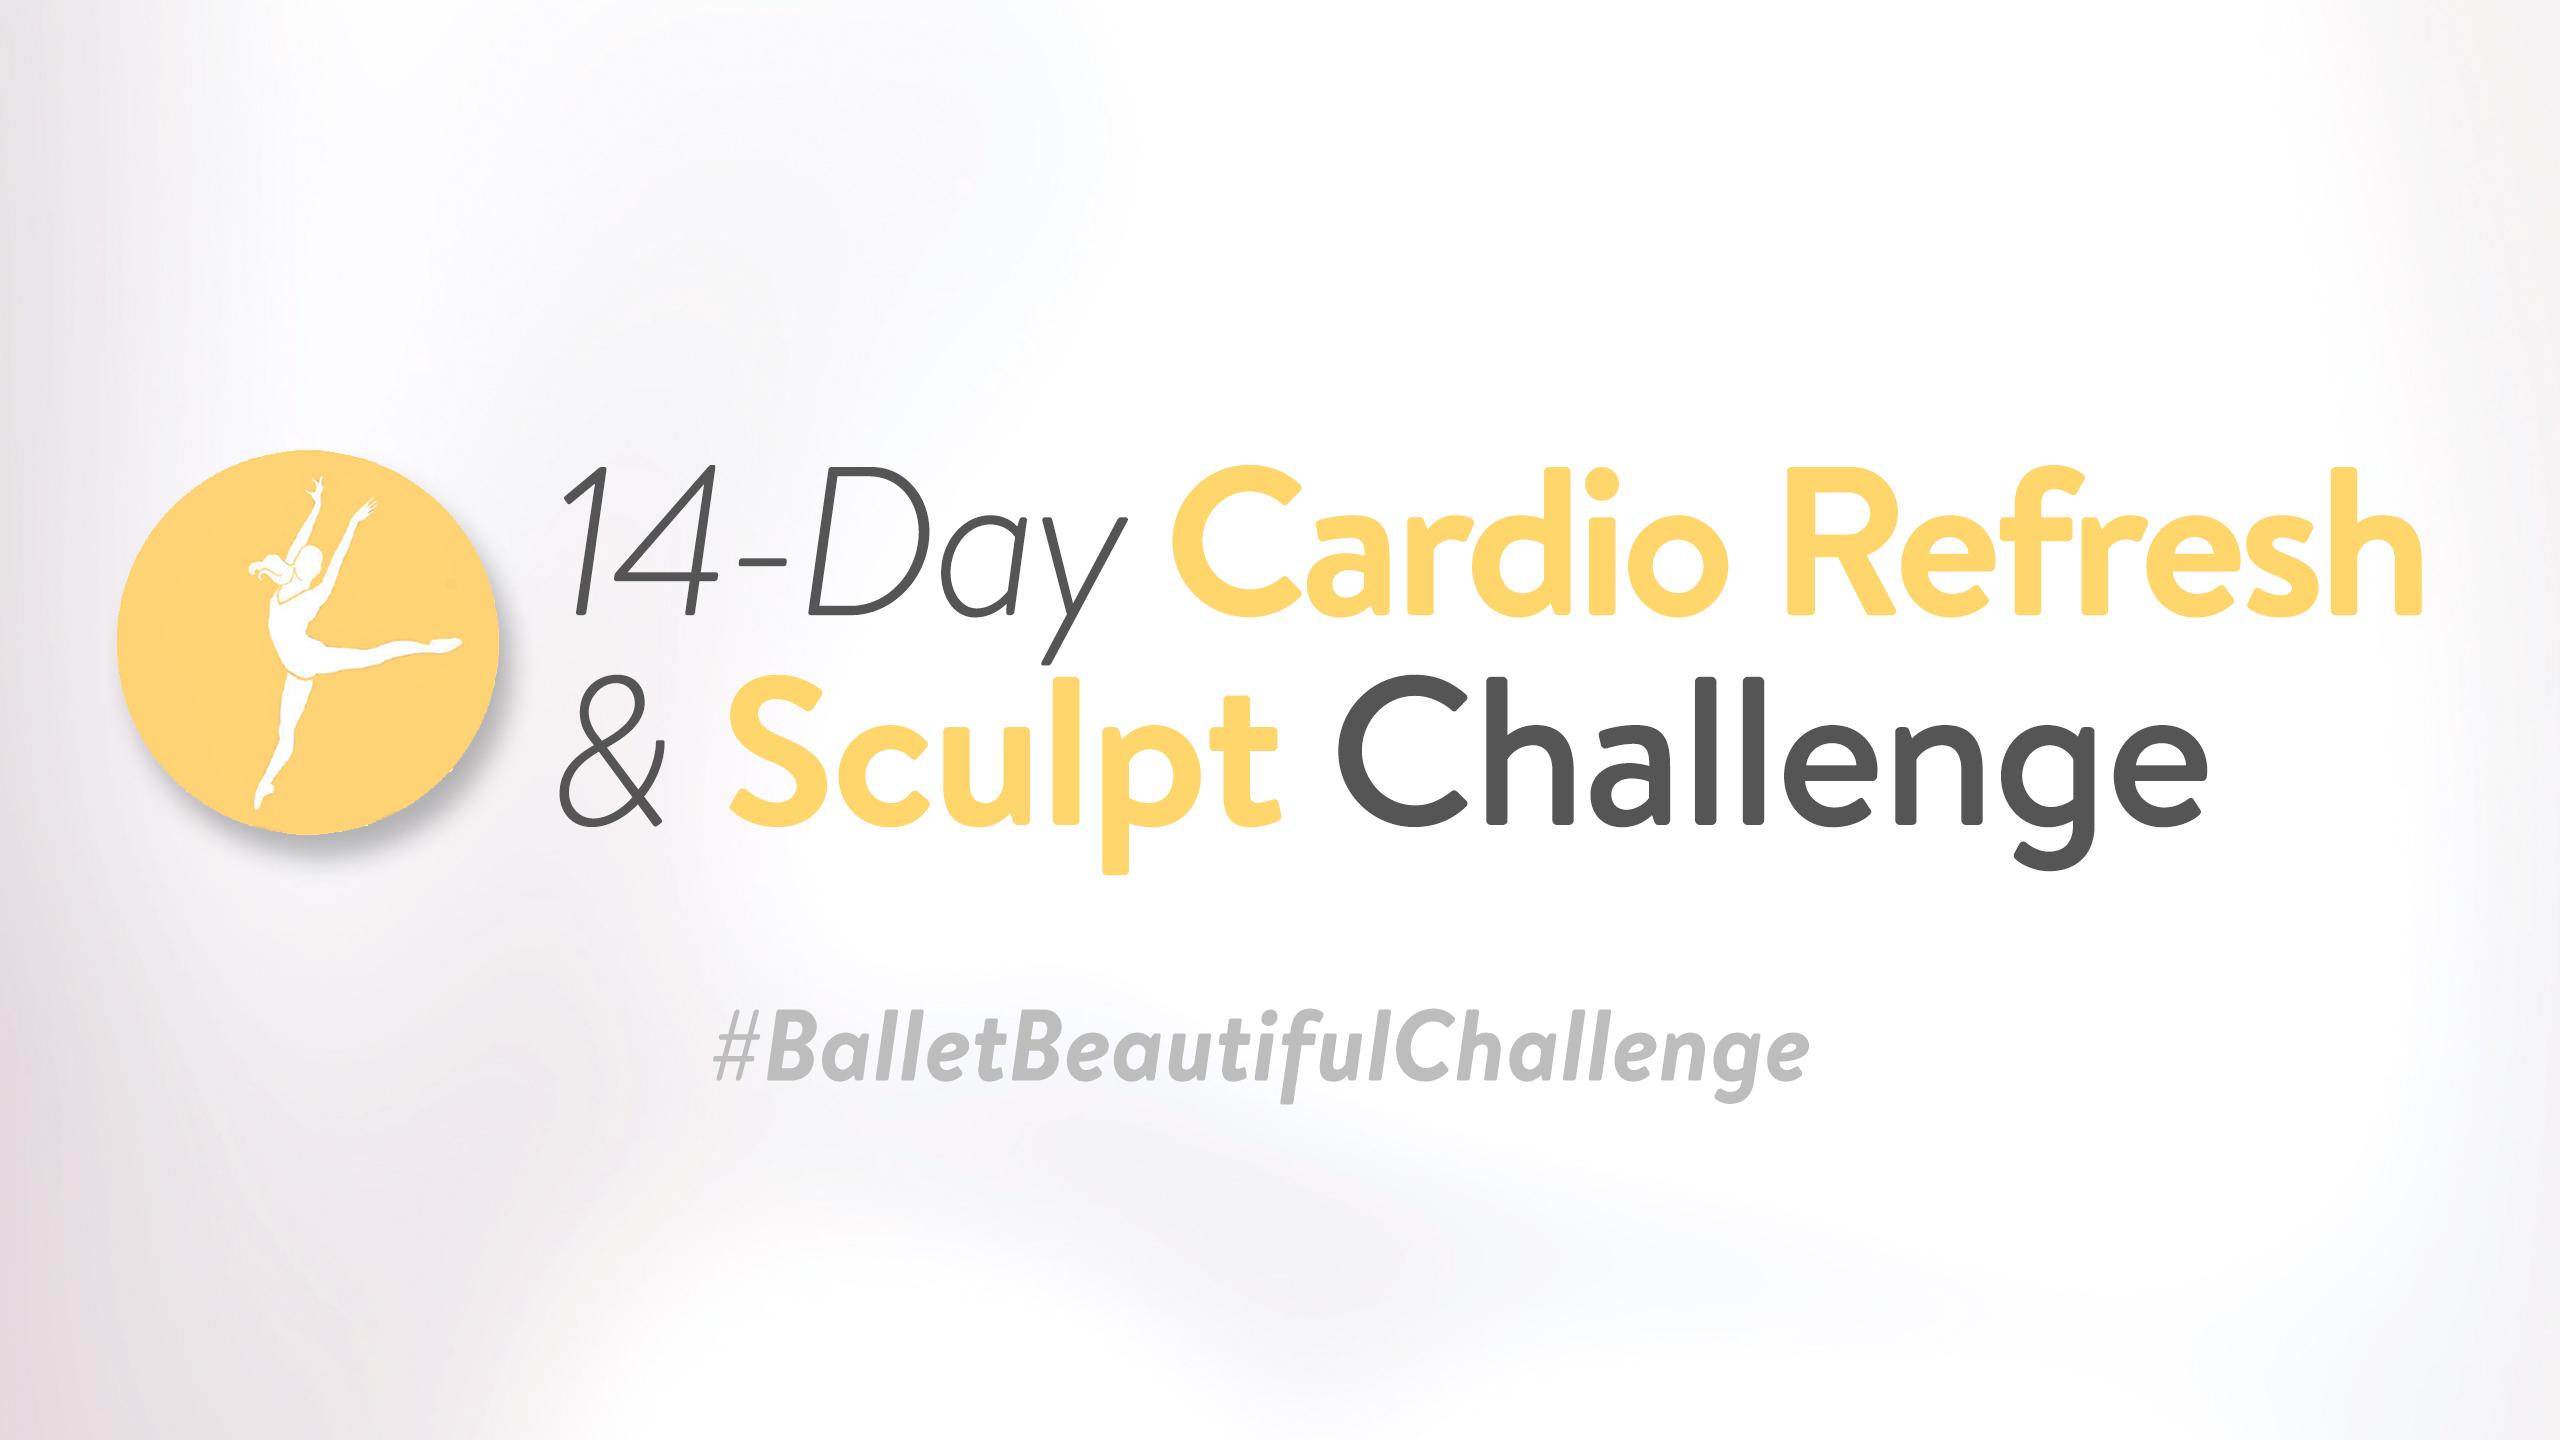 Cardio Refresh & Sculpt Challenge